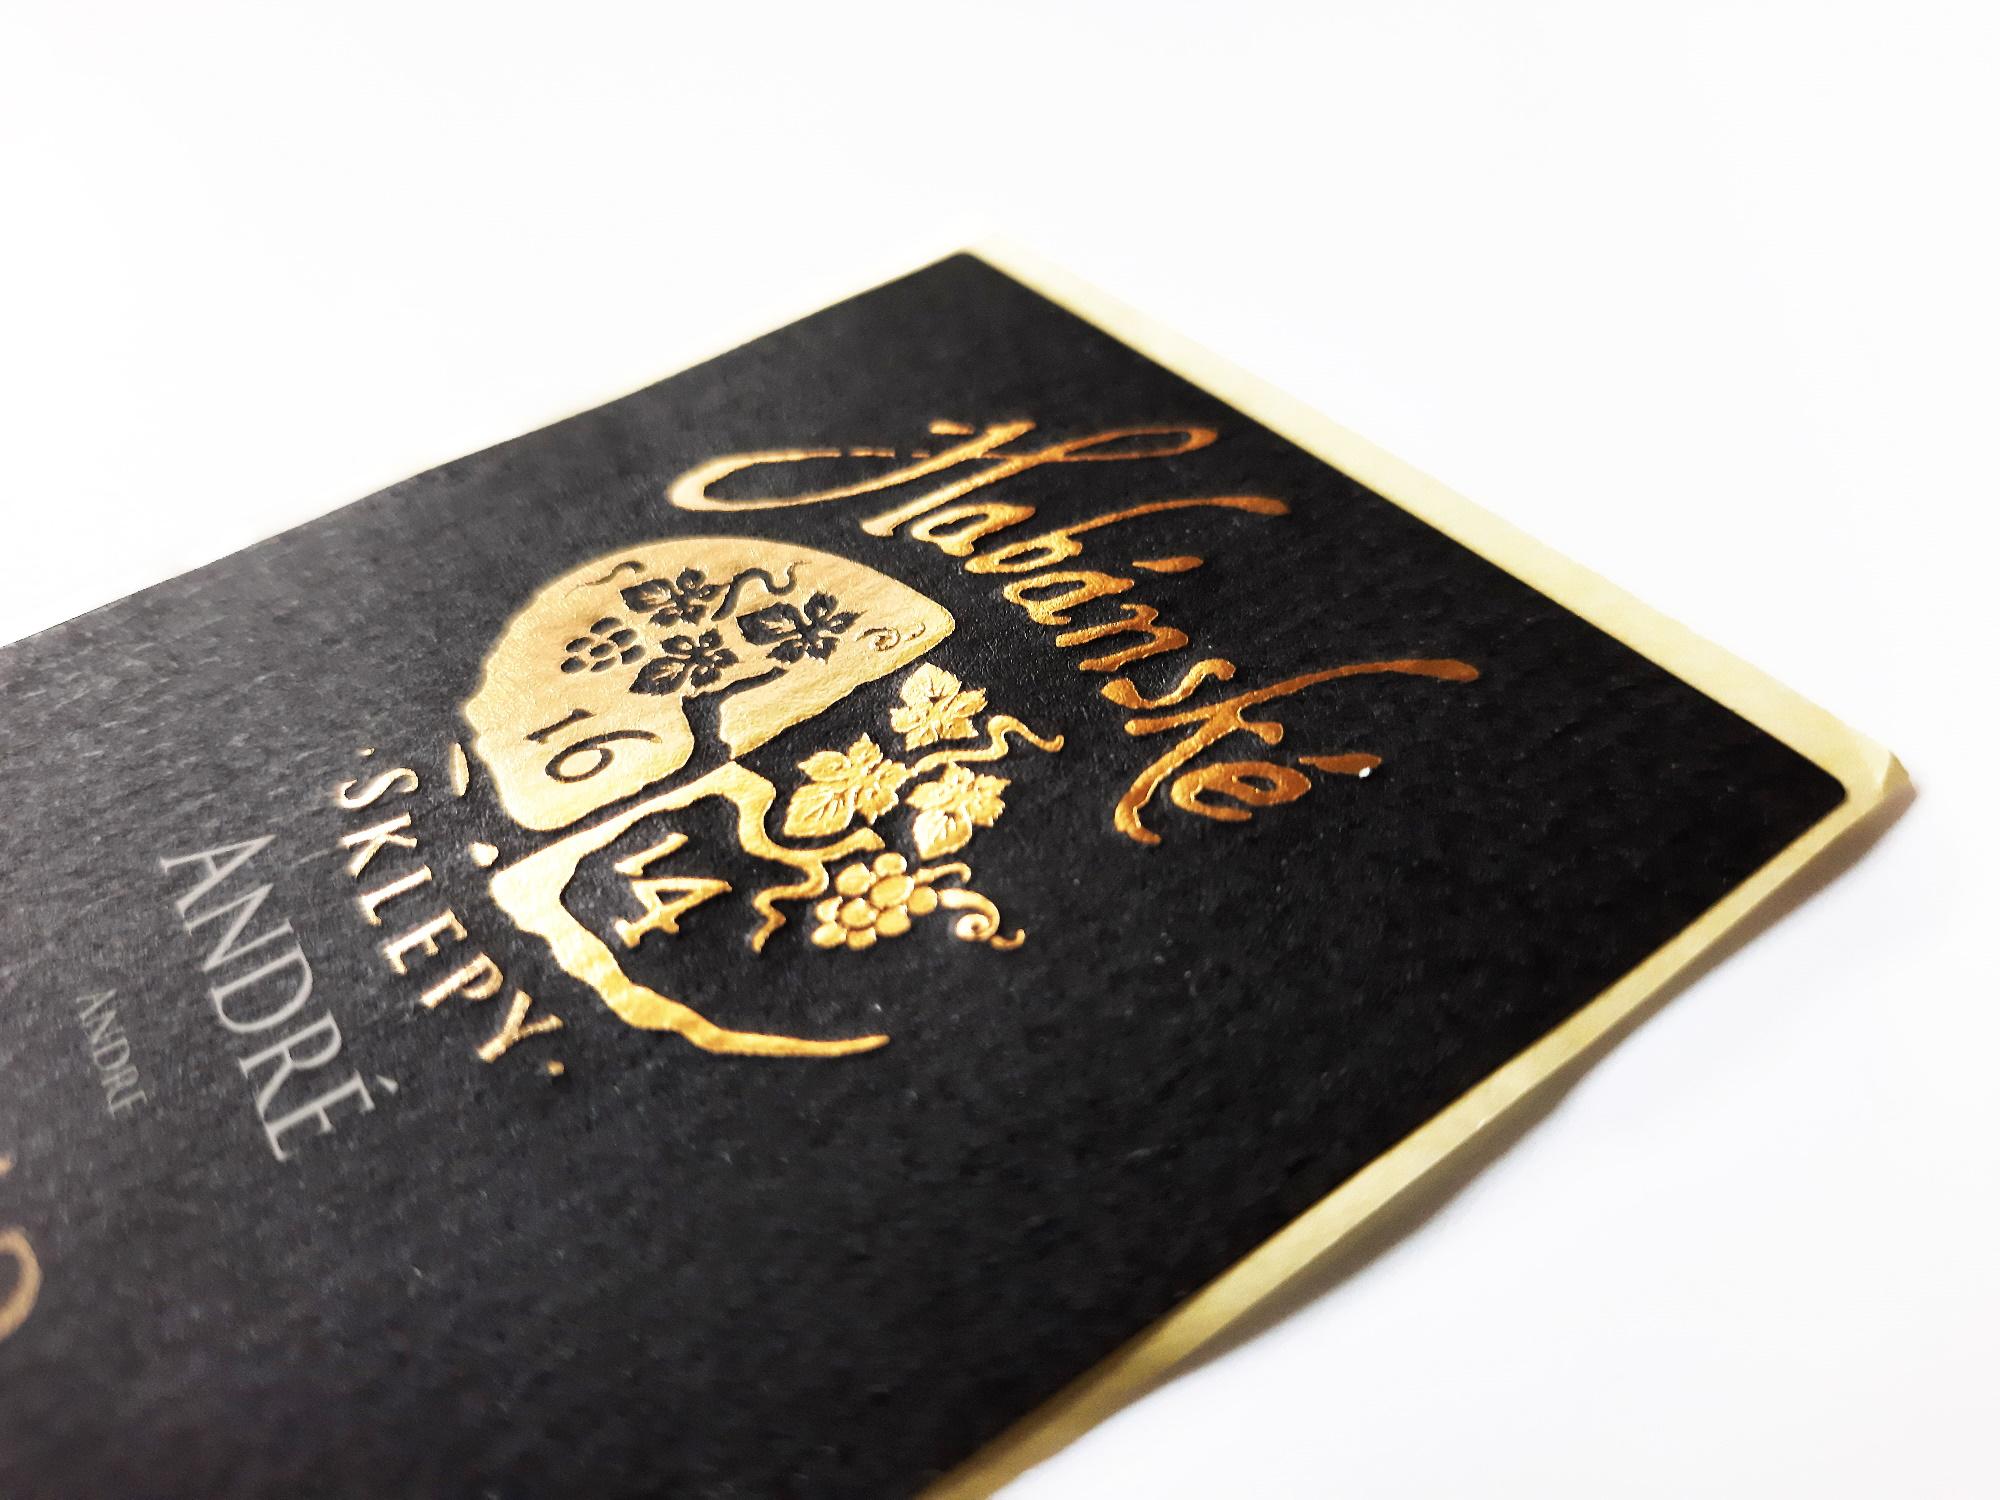 embos zlatá horká řažba label design